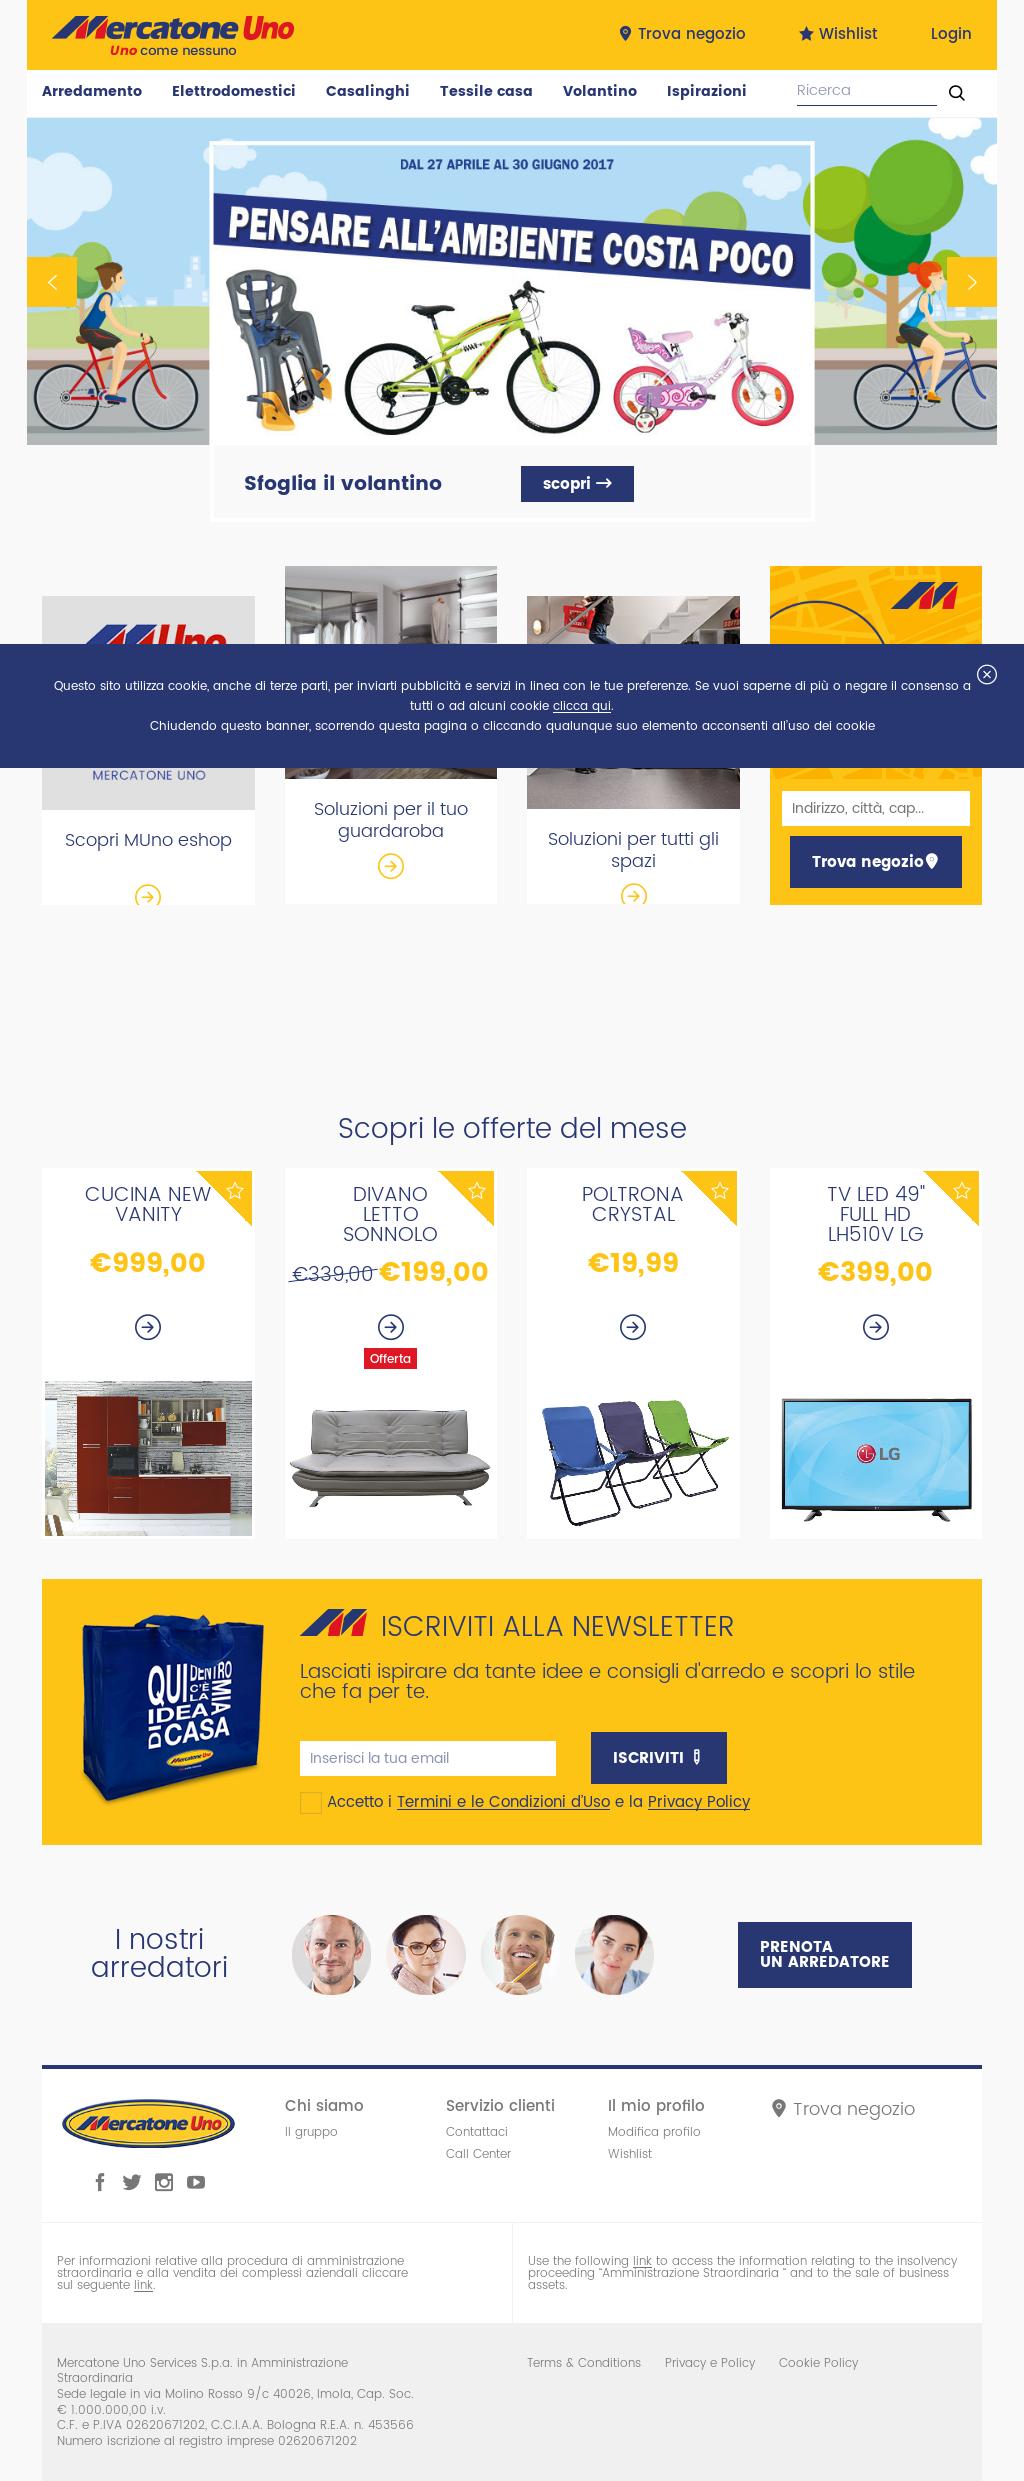 Mercatone Uno Competitors, Revenue and Employees - Owler ...